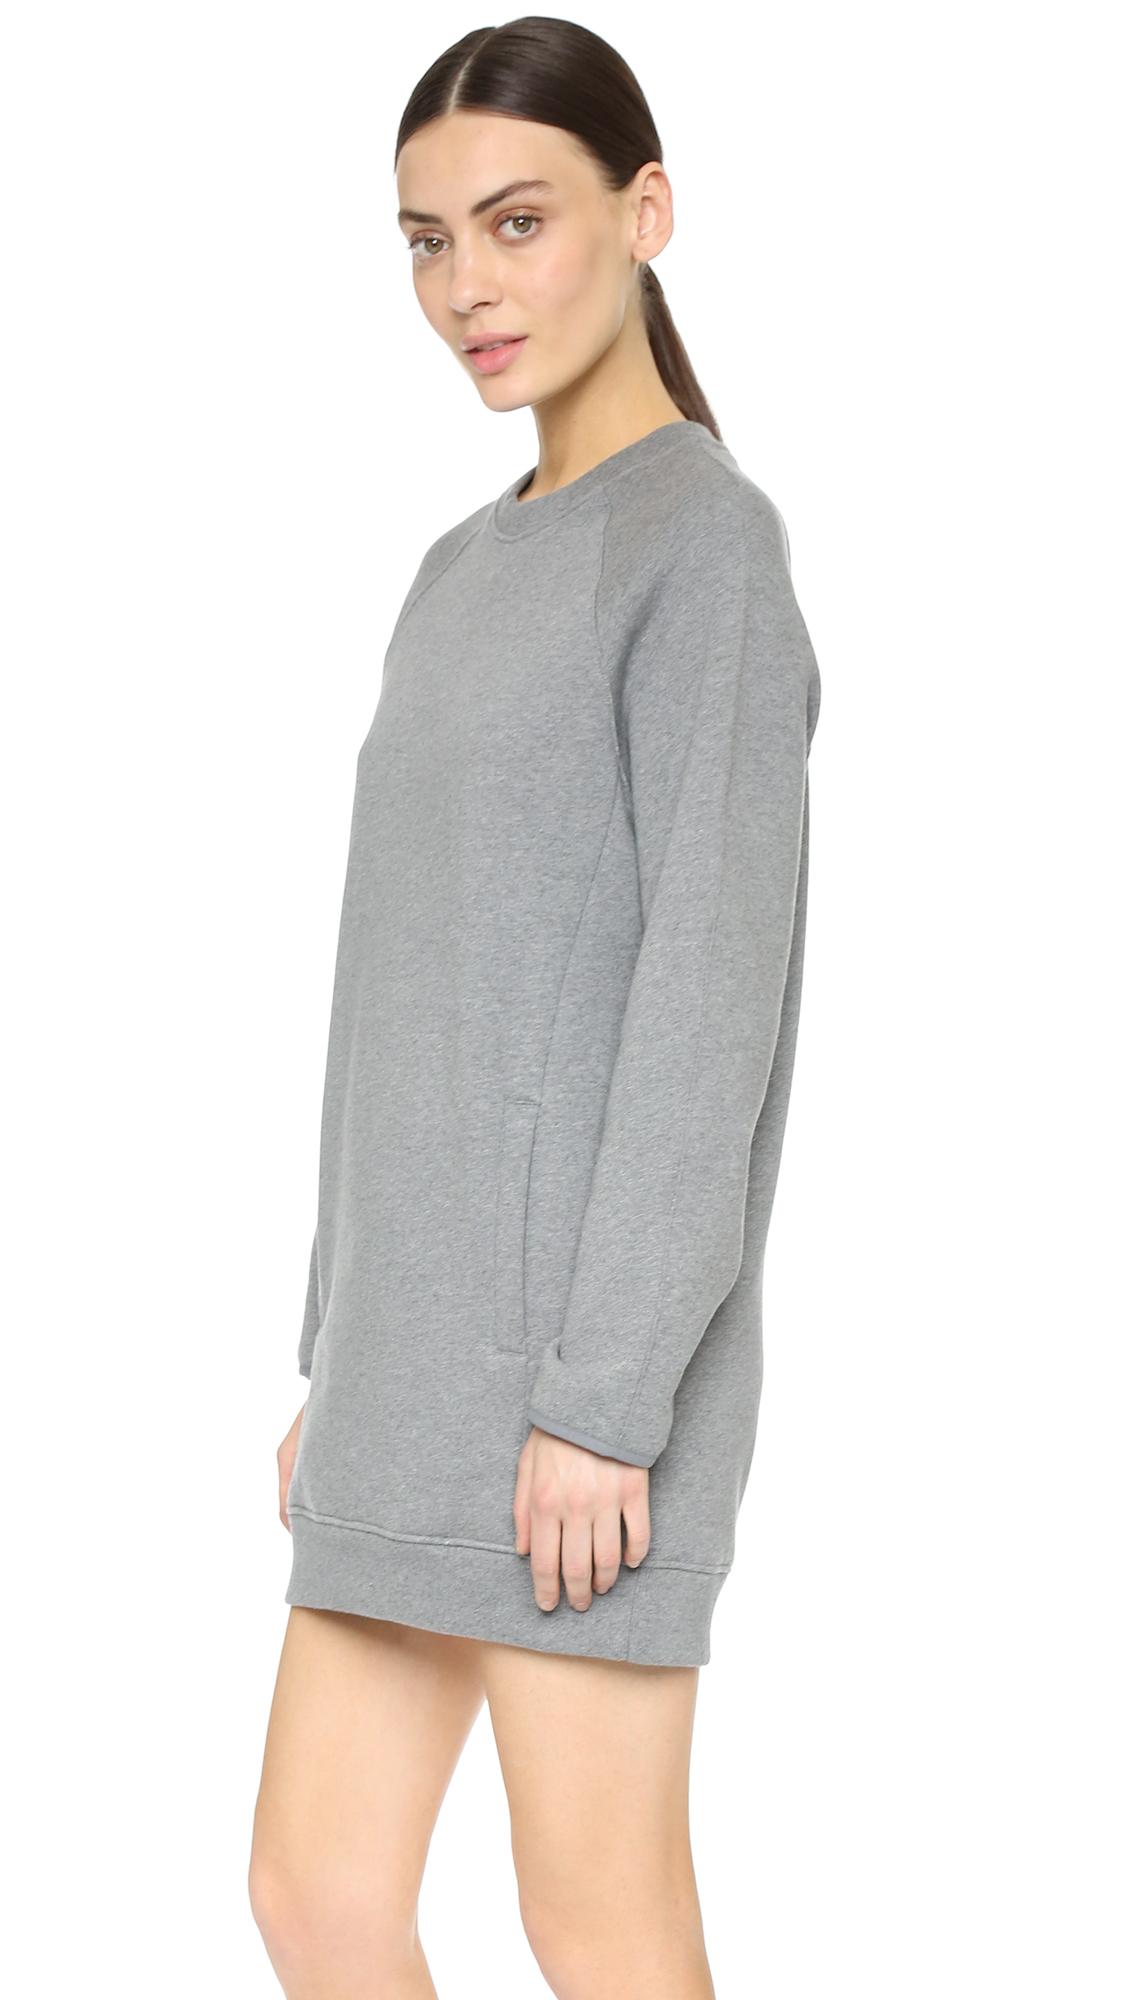 Lyst Acne Studios Fiera Sweatshirt Dress Dark Grey